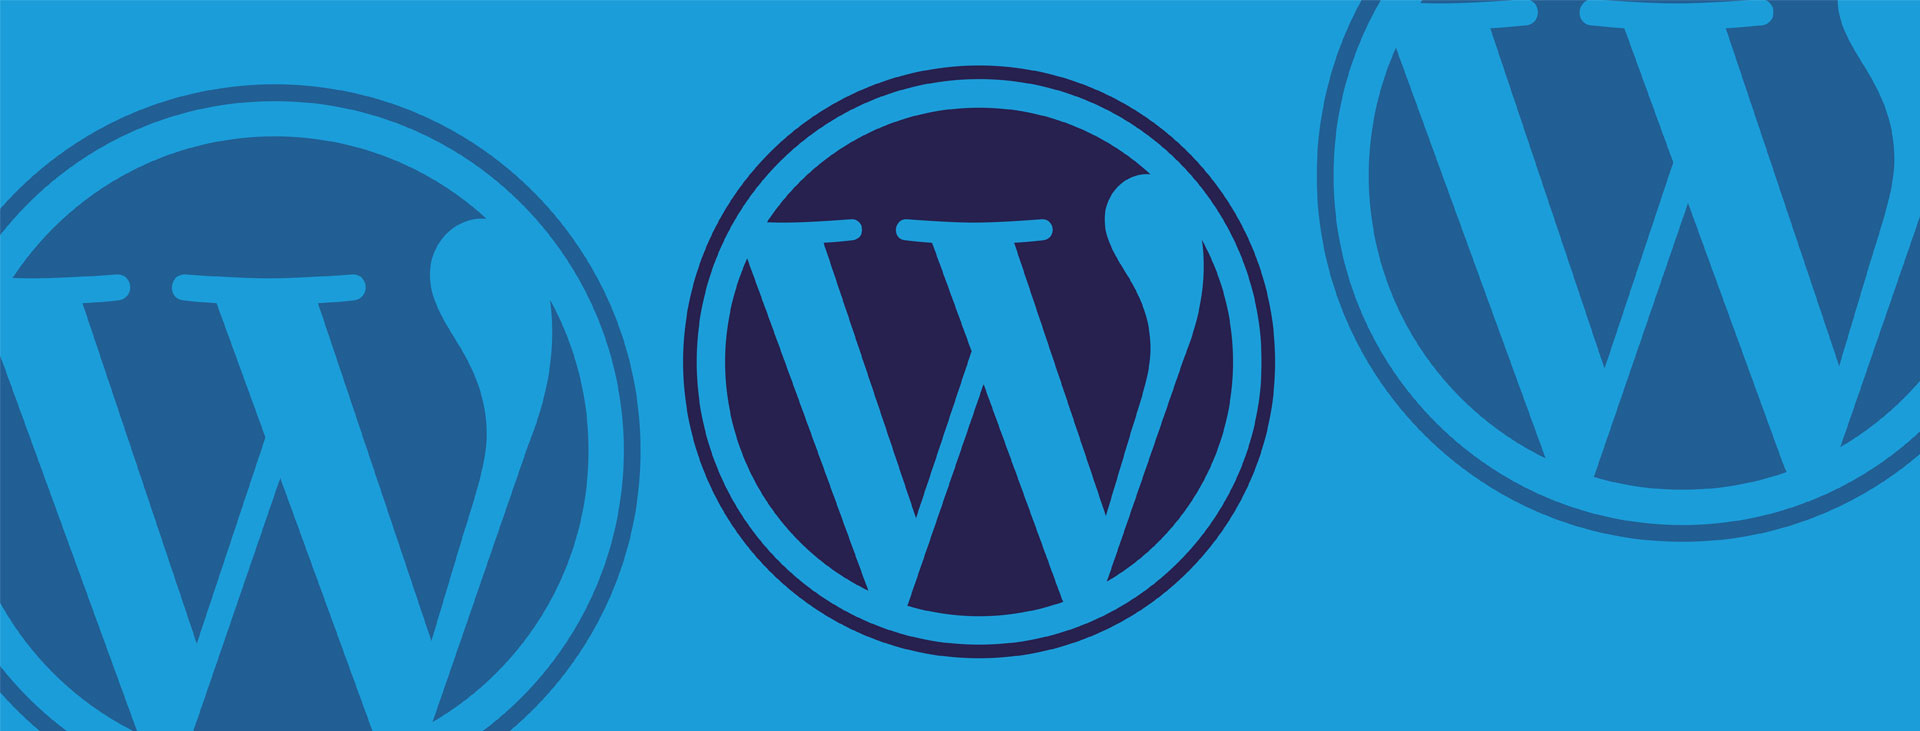 Benefits of using WordPress for your website